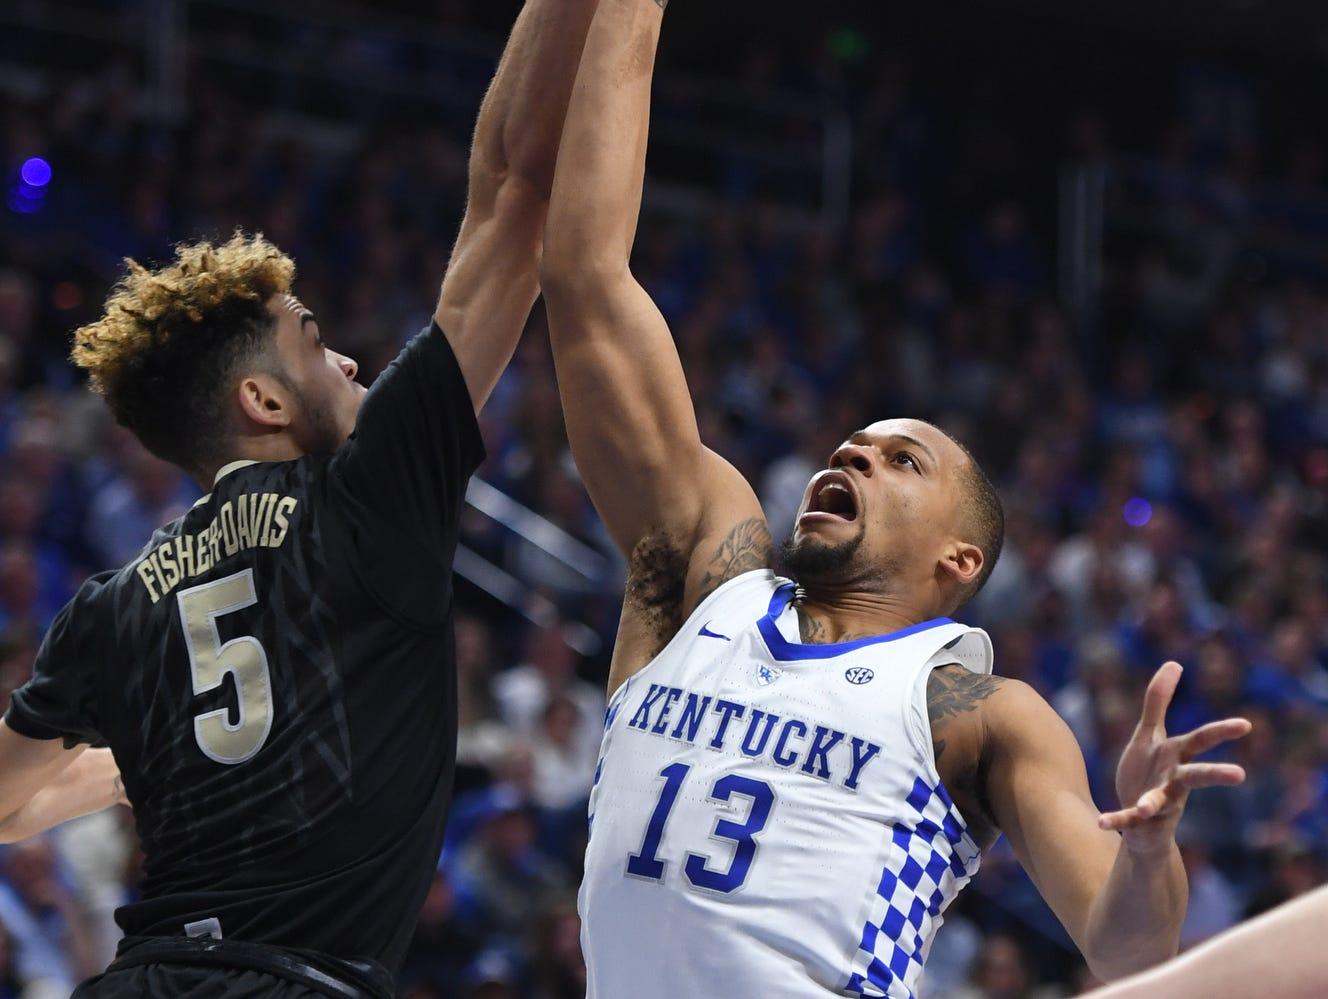 Cowgill 6 Uk Basketball Visits Vanderbilt Tuesday: Isaiah Briscoe: 'I Don't Think I've Been Struggling'